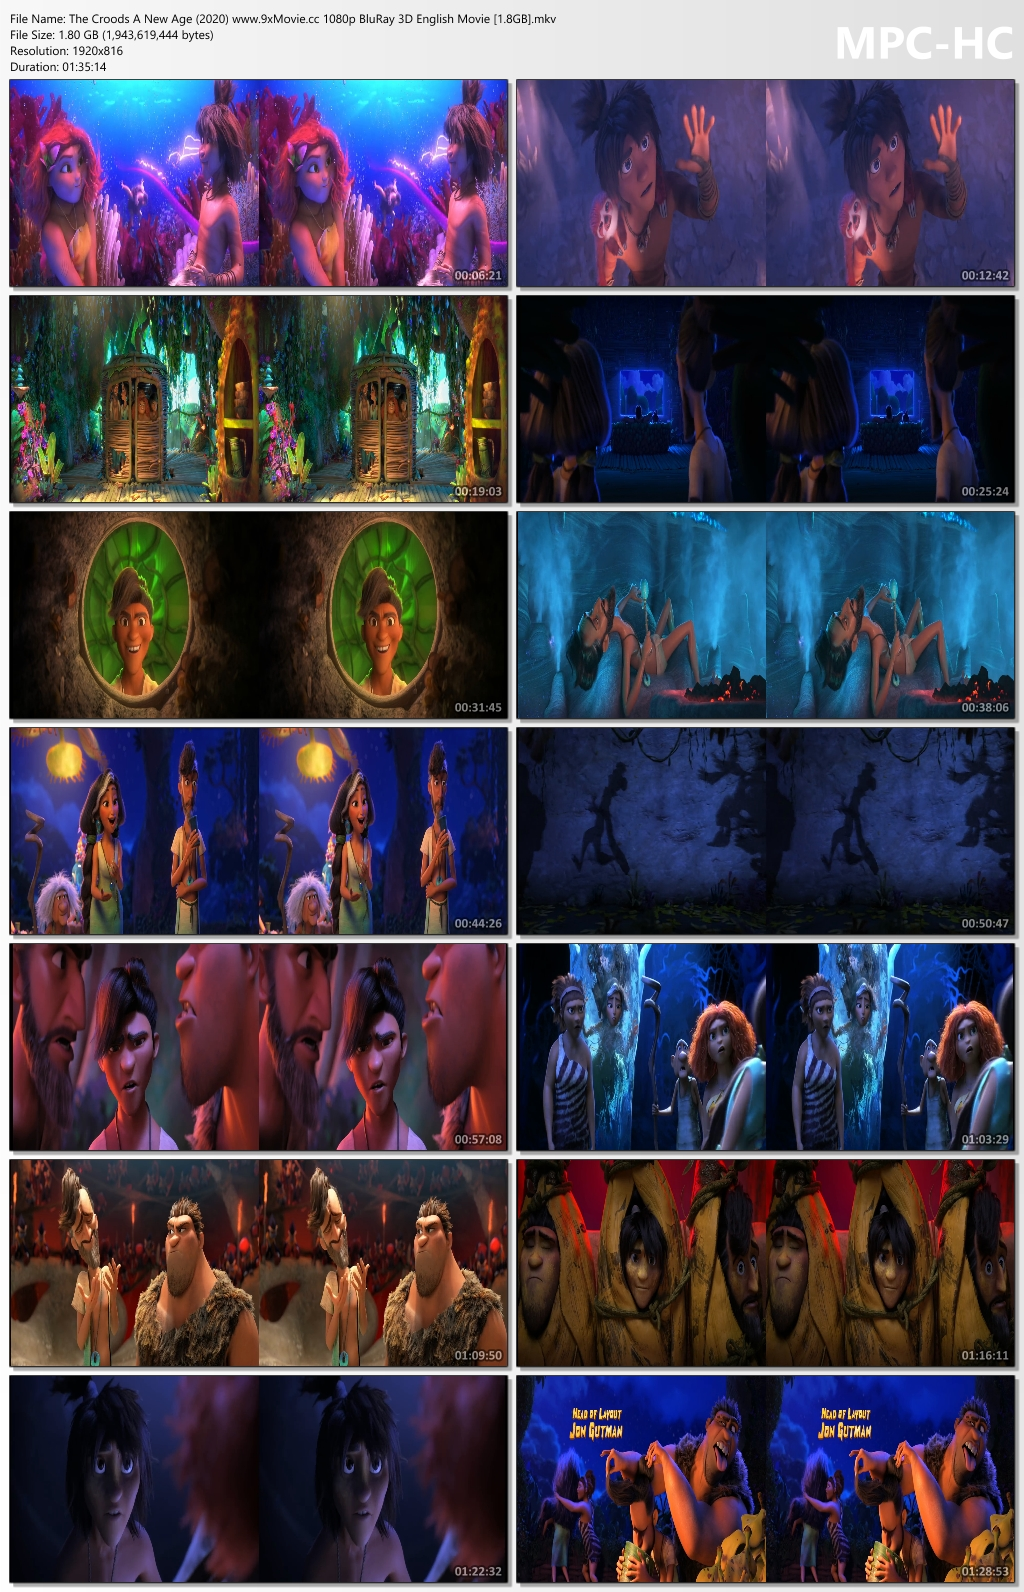 The-Croods-A-New-Age-2020-www-9x-Movie-cc-1080p-Blu-Ray-3-D-English-Movie-1-8-GB-mkv